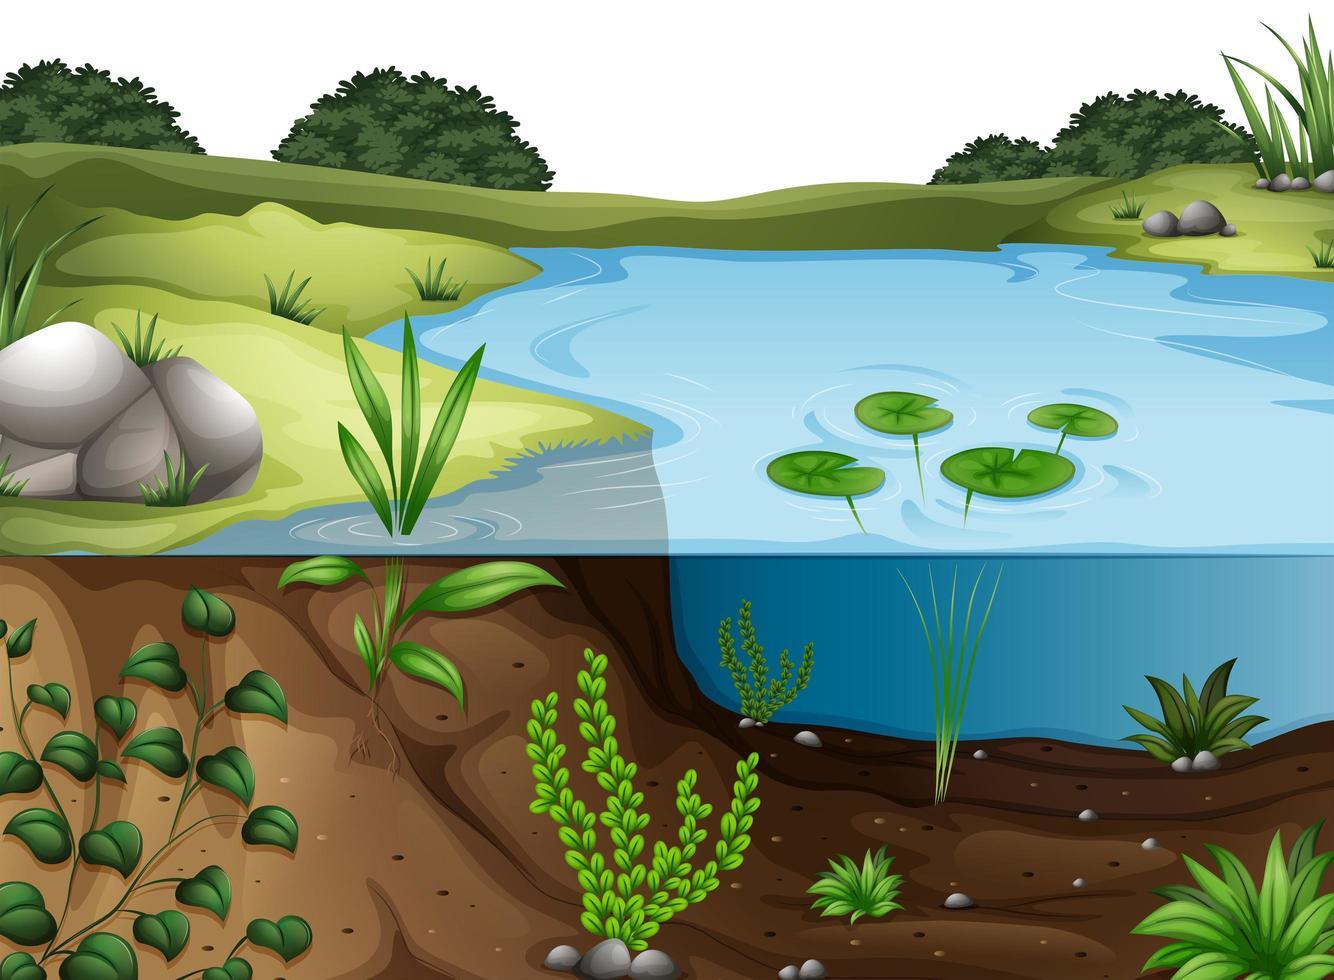 natürliche Umgebung Landschaftsszene vektor